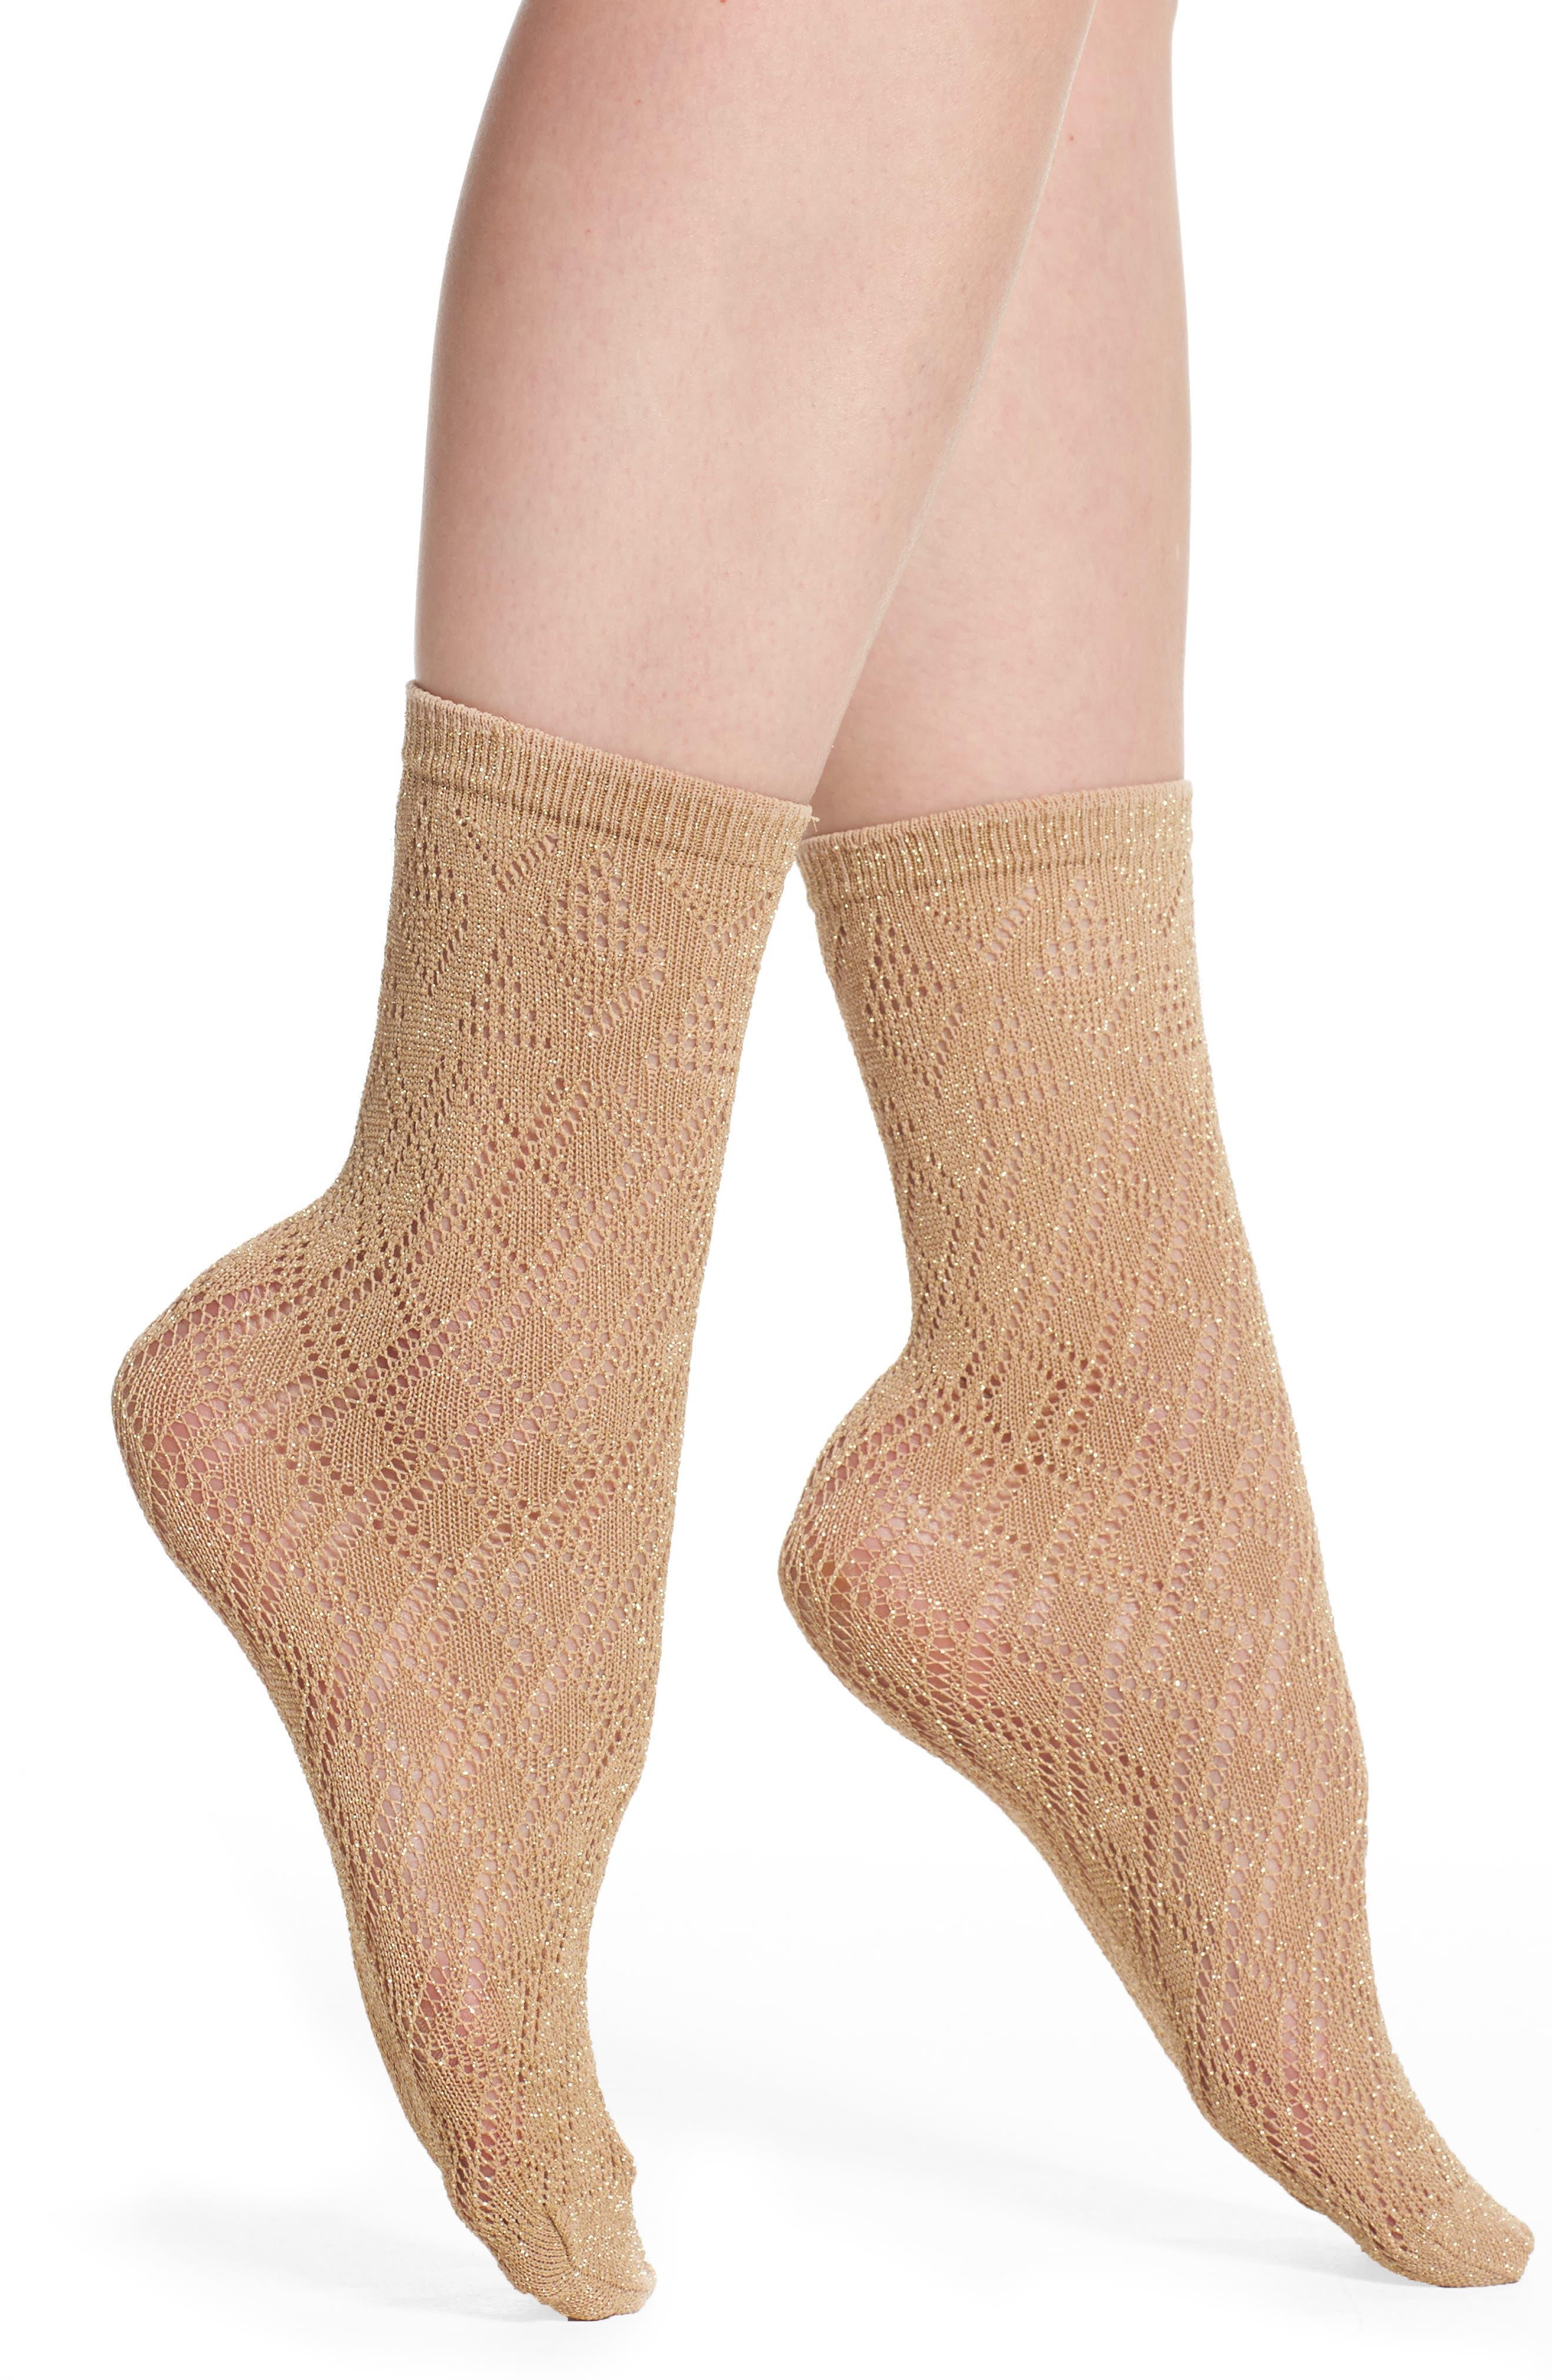 Kathy Trouser Socks,                         Main,                         color, Gold